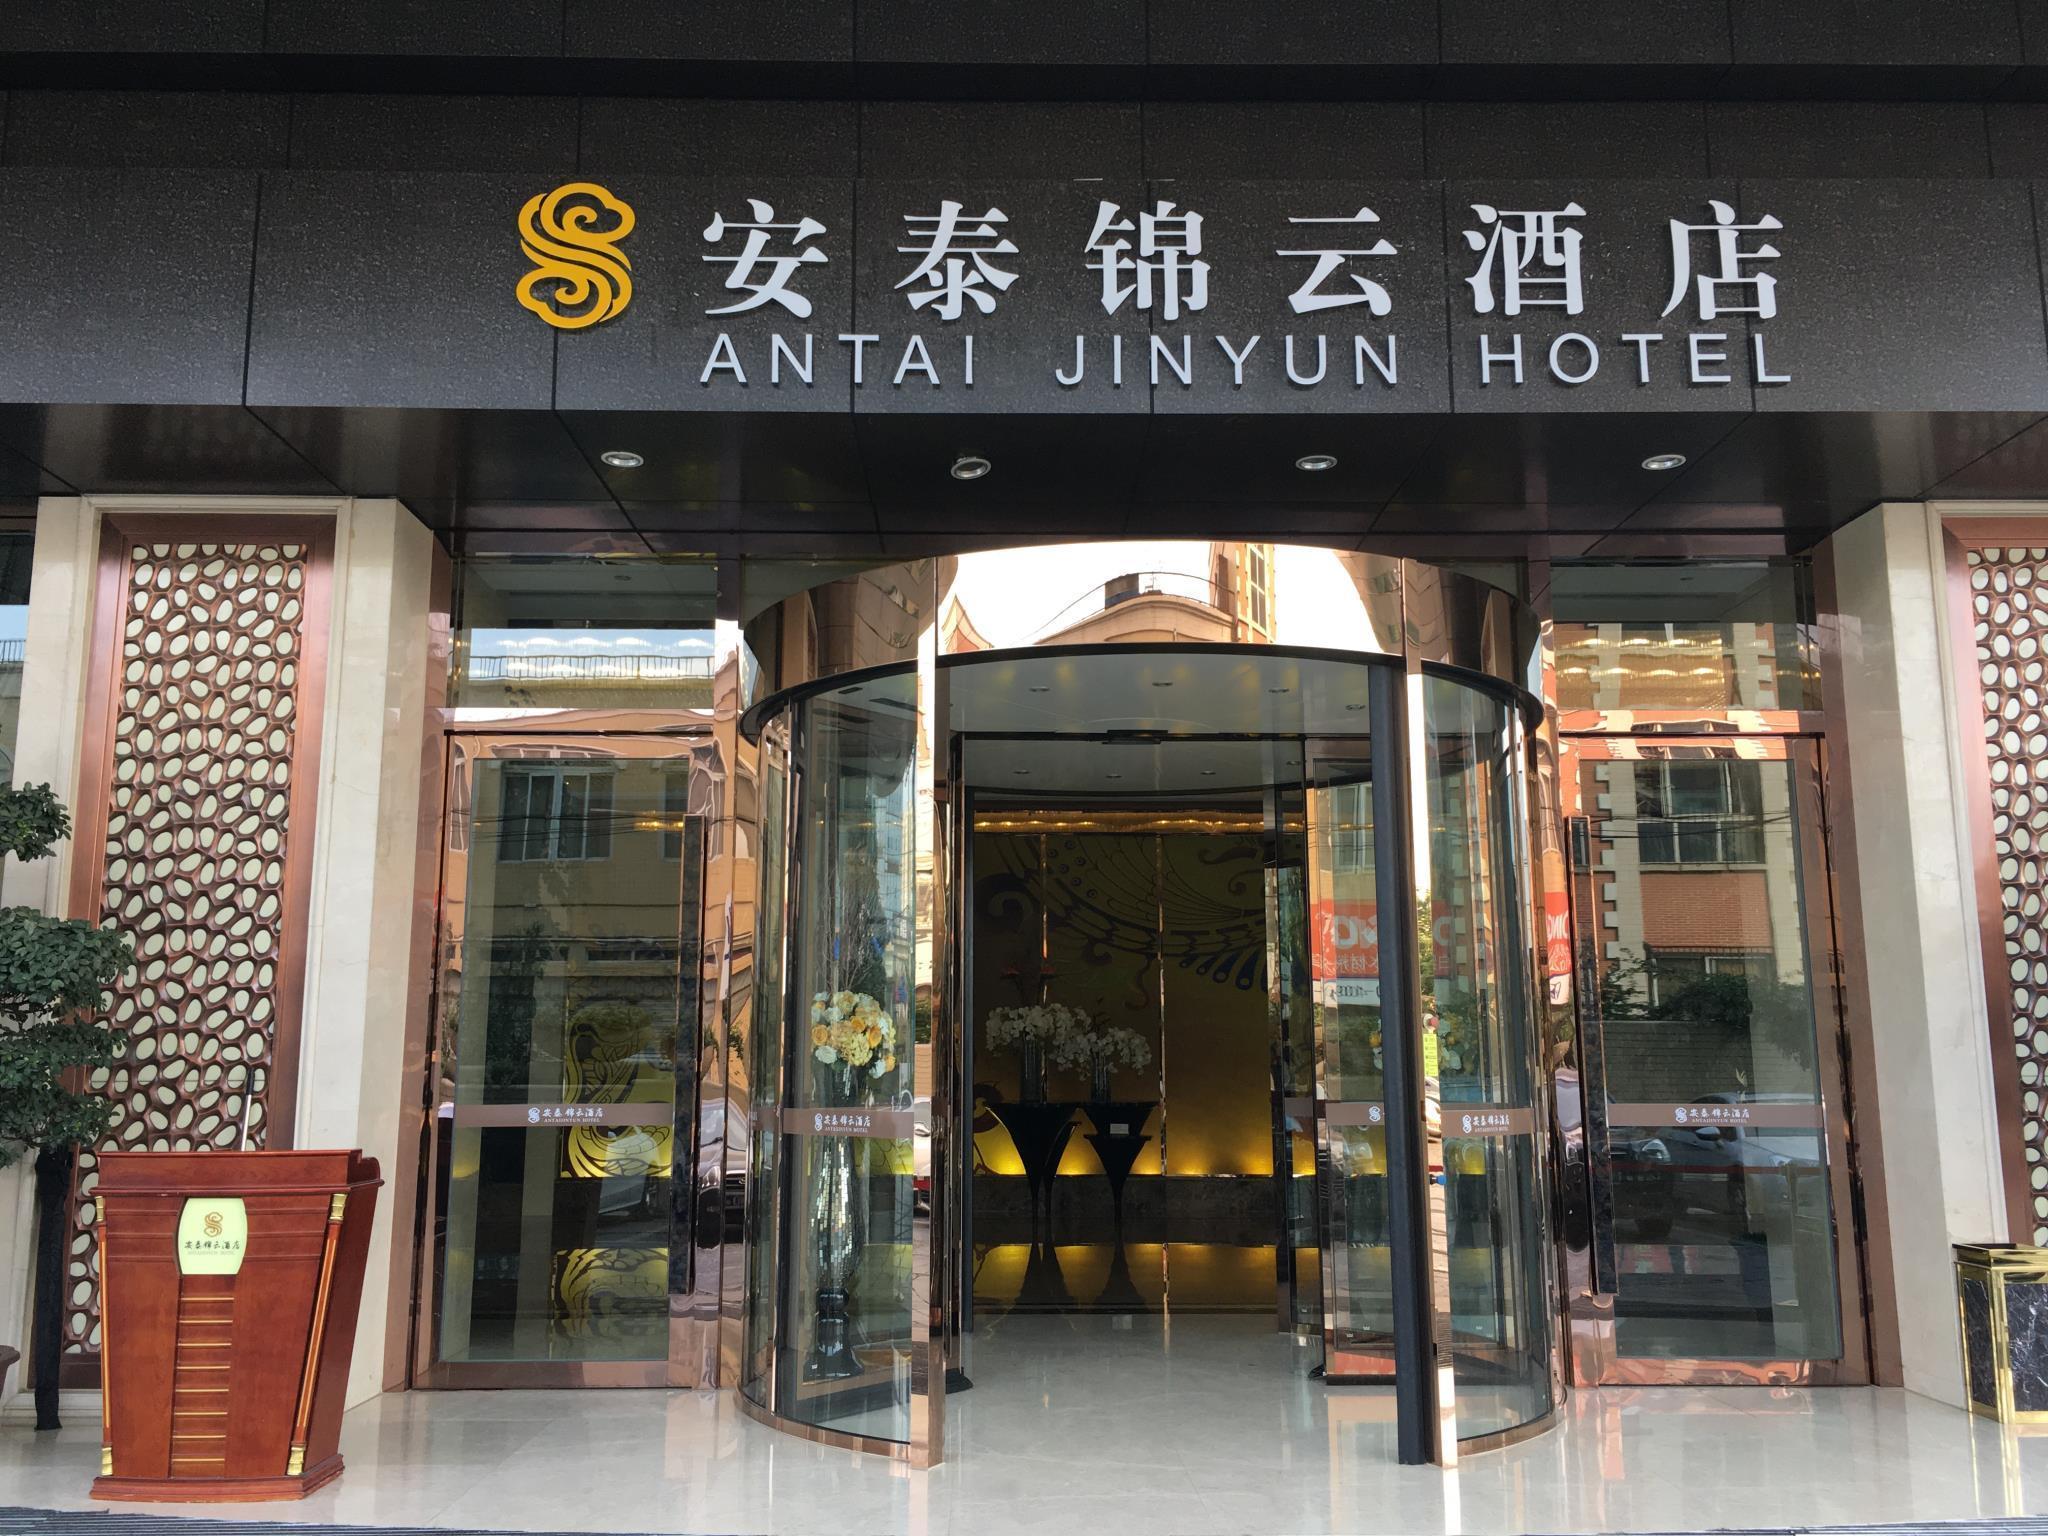 Sichuan Antai Jinyun Hotel